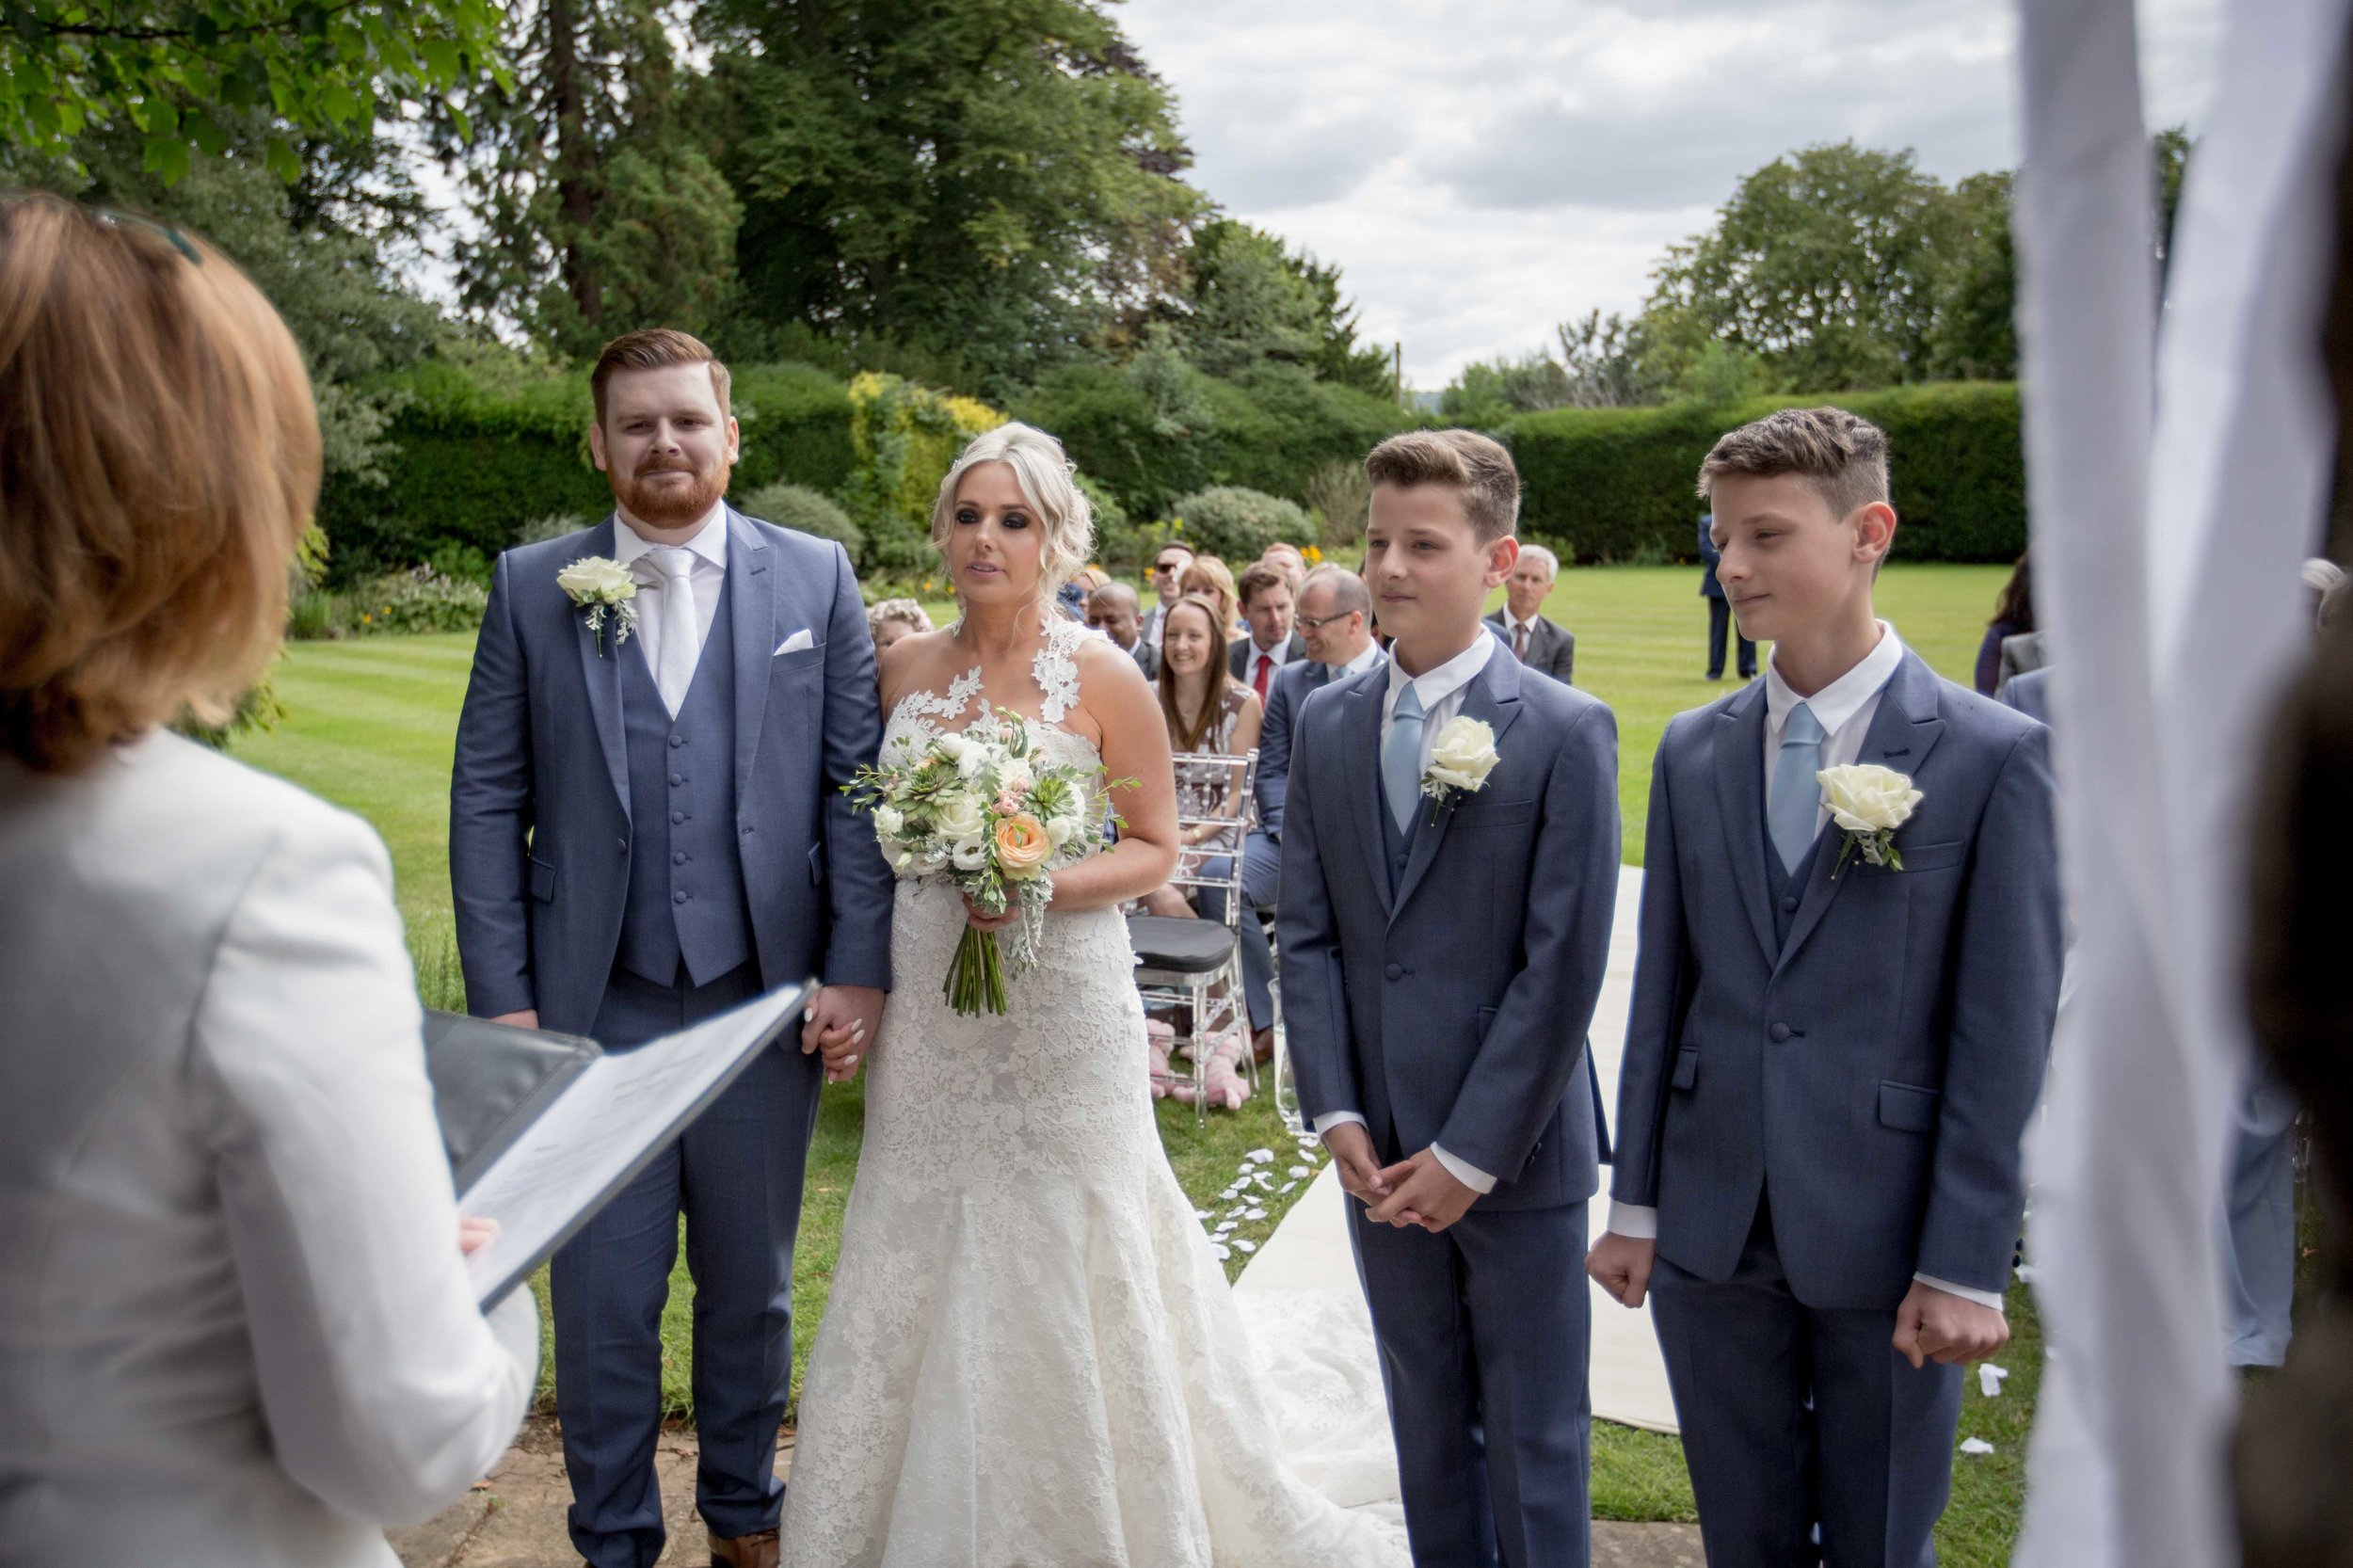 cotswold-wedding-photography-at-stonehouse-court-hotel-natalia-smith-photography-gloucestershire-wedding-photographer-35.jpg